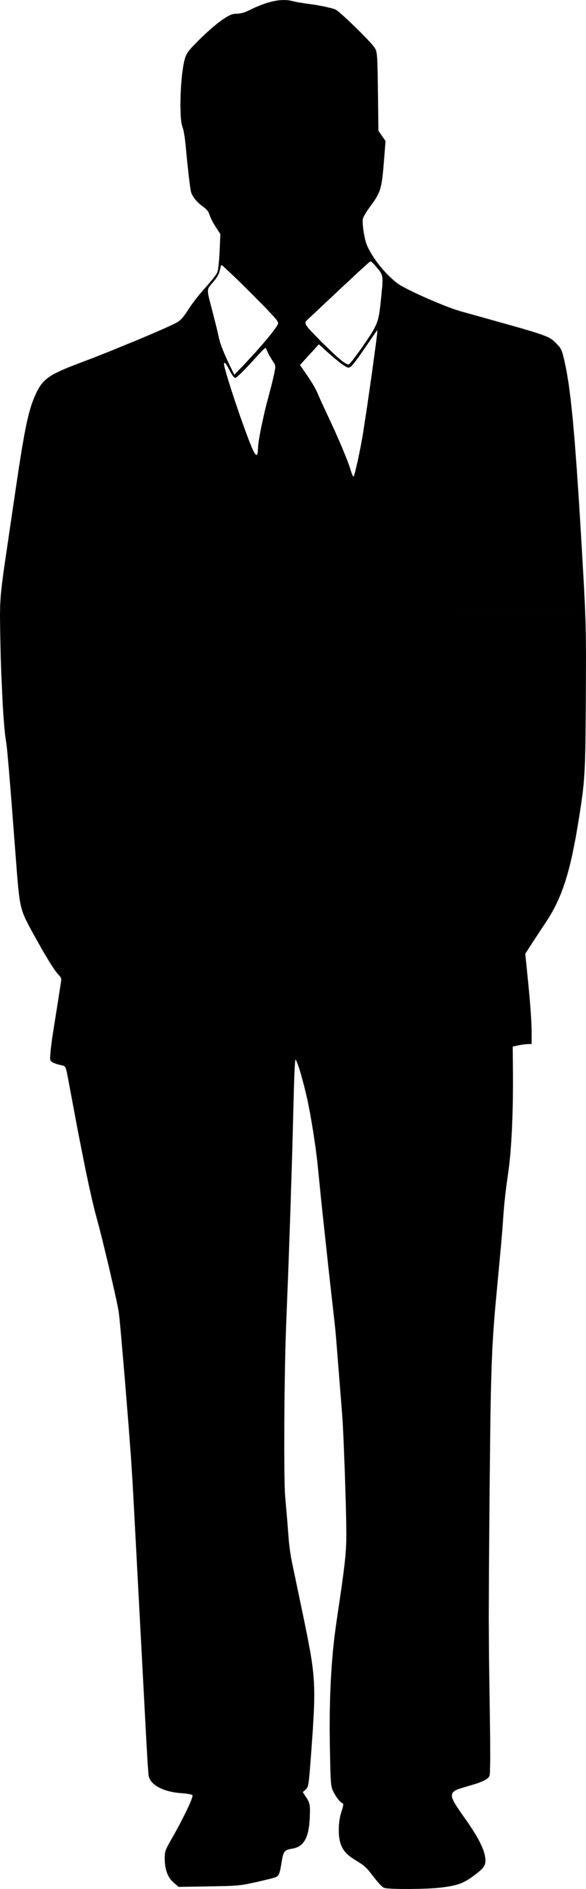 Human Silhouette Clip Art